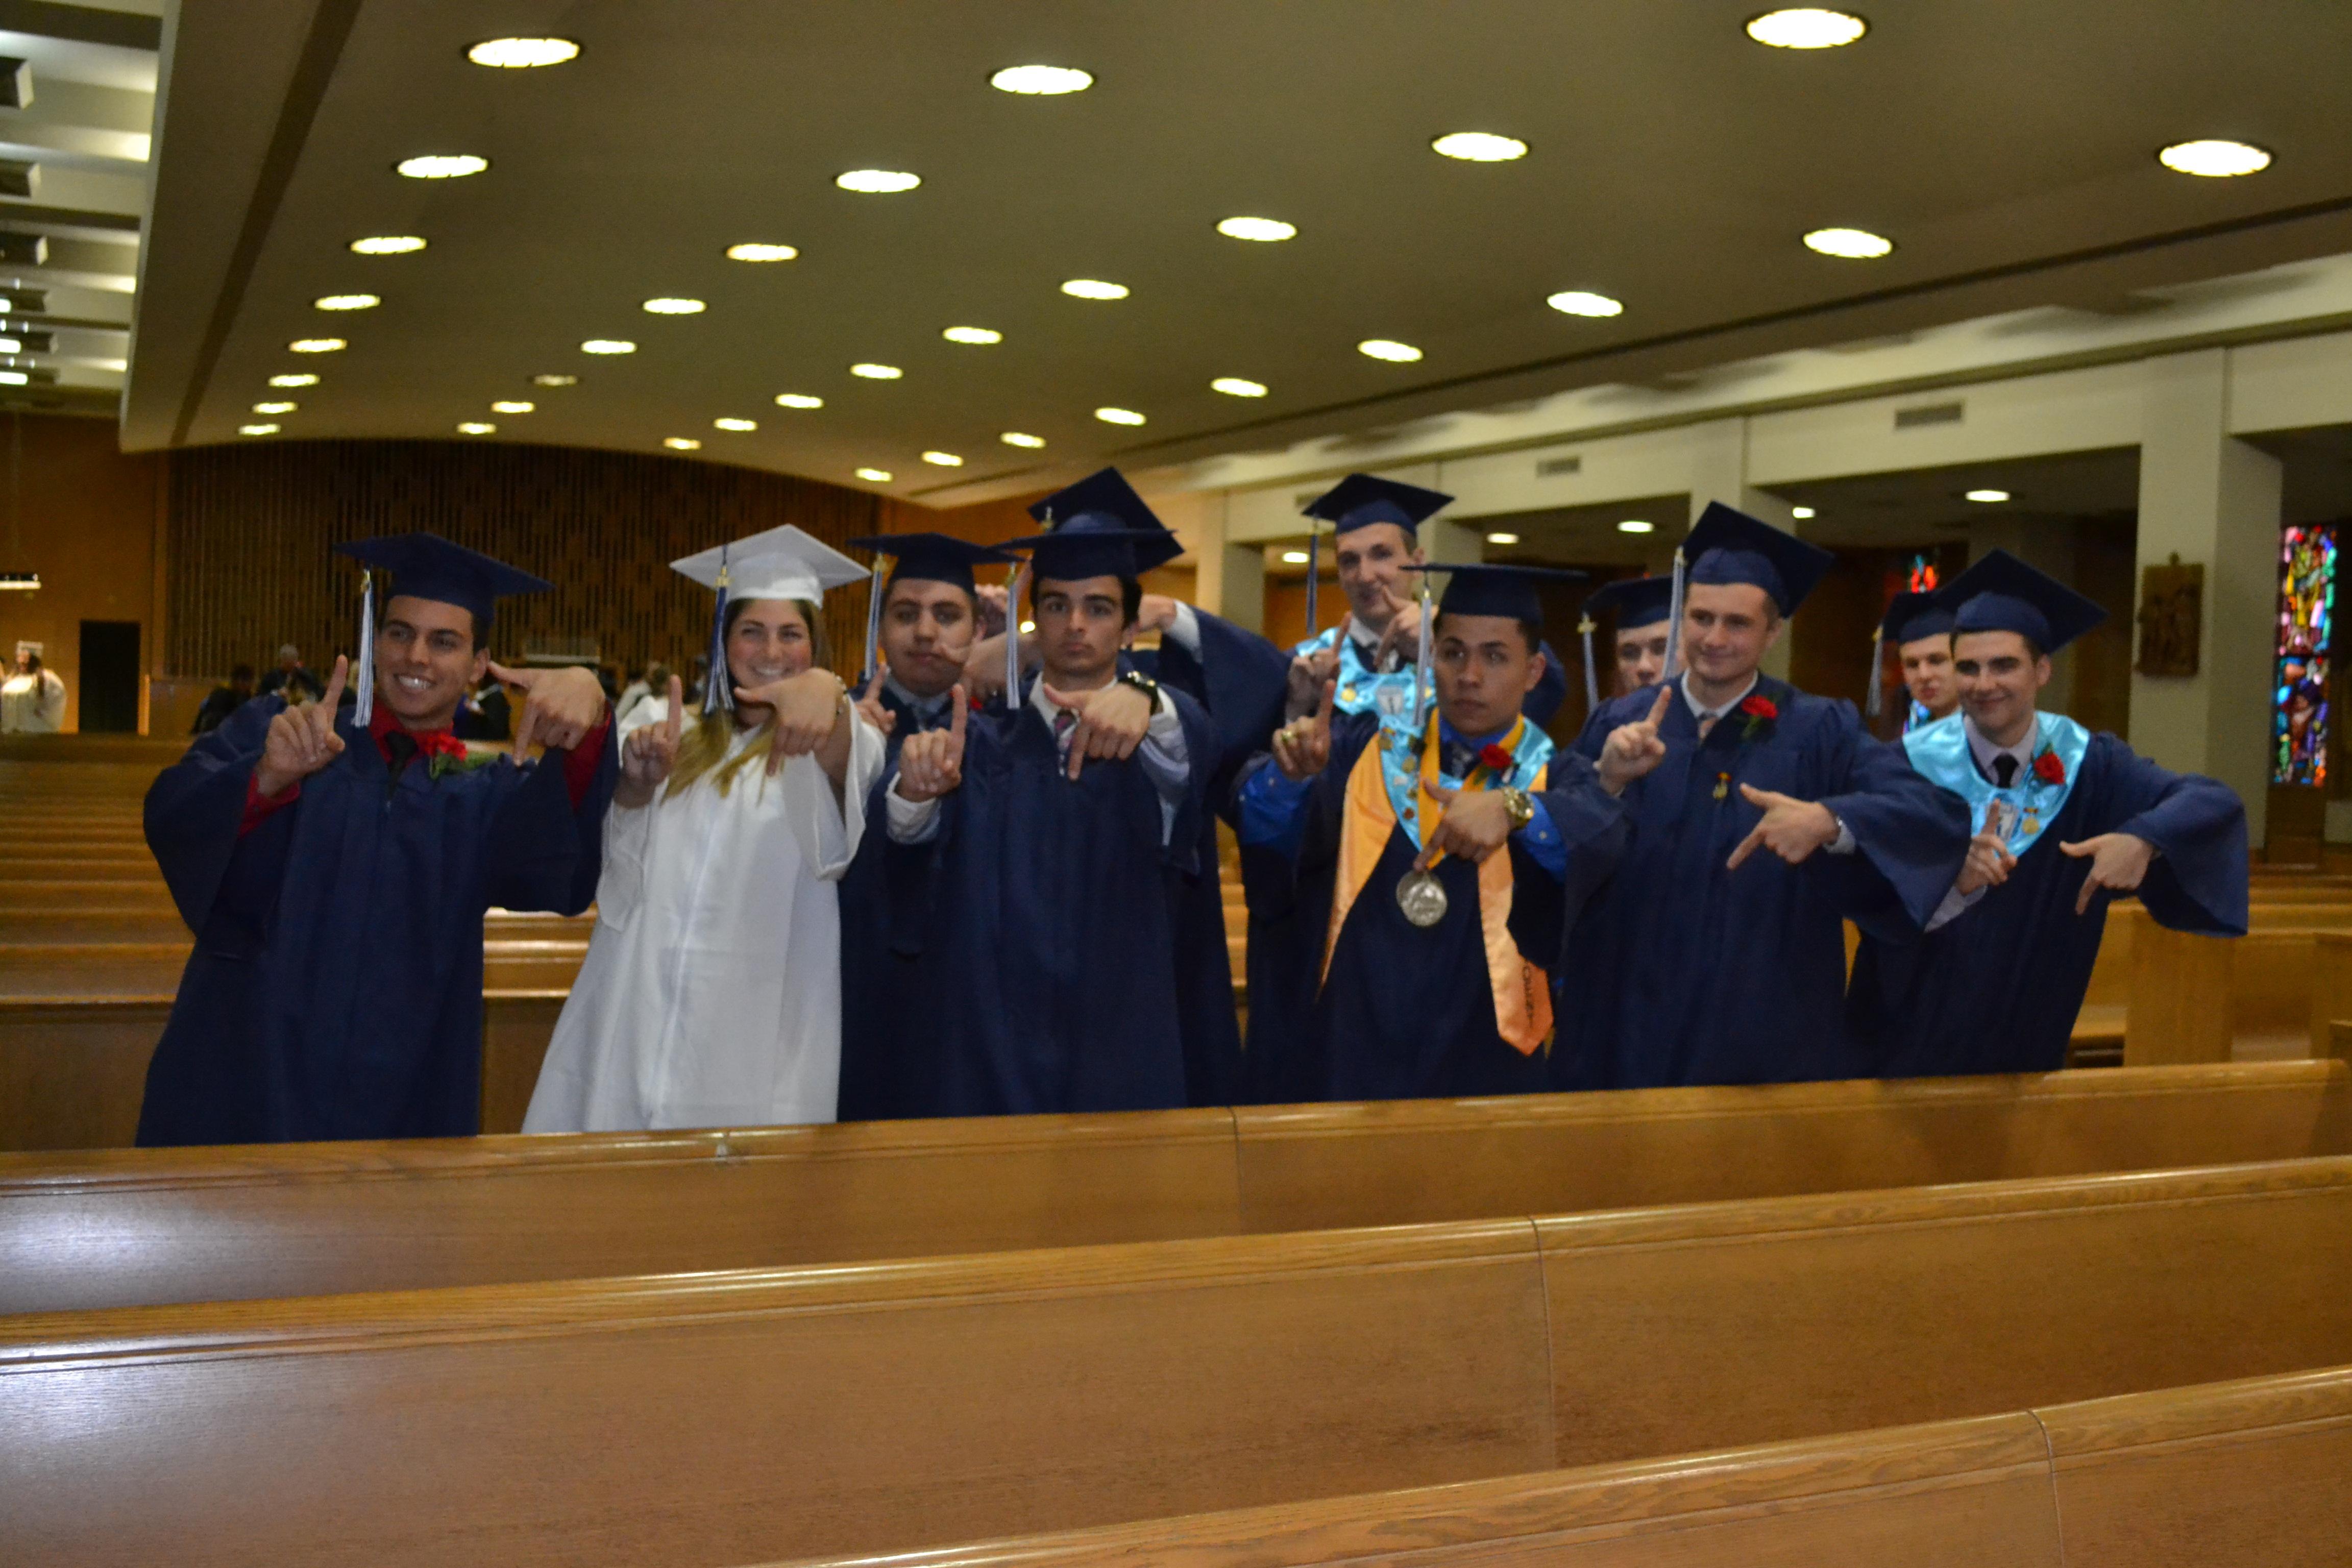 graduationcandids2017-62